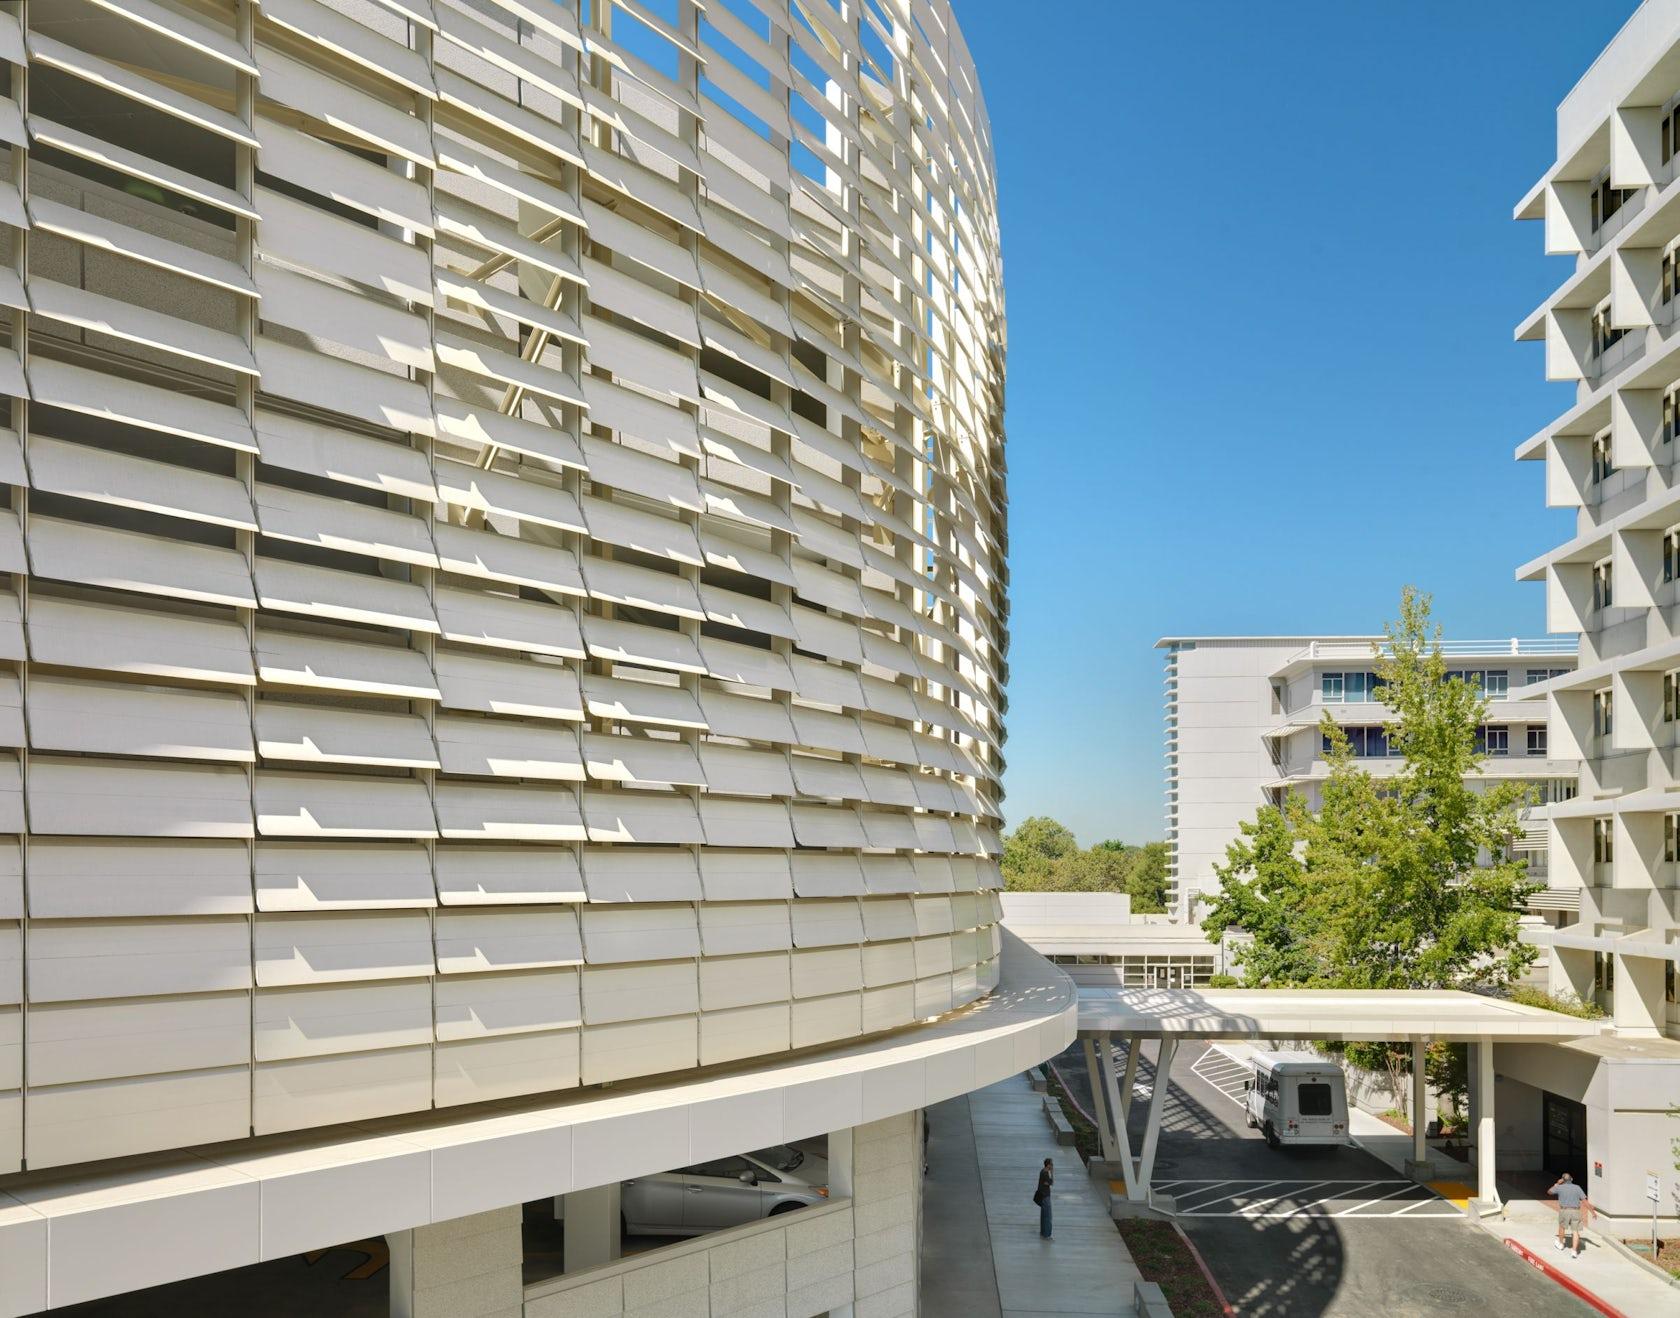 Uc Davis Medical Center Parking Structure Iii Architizer